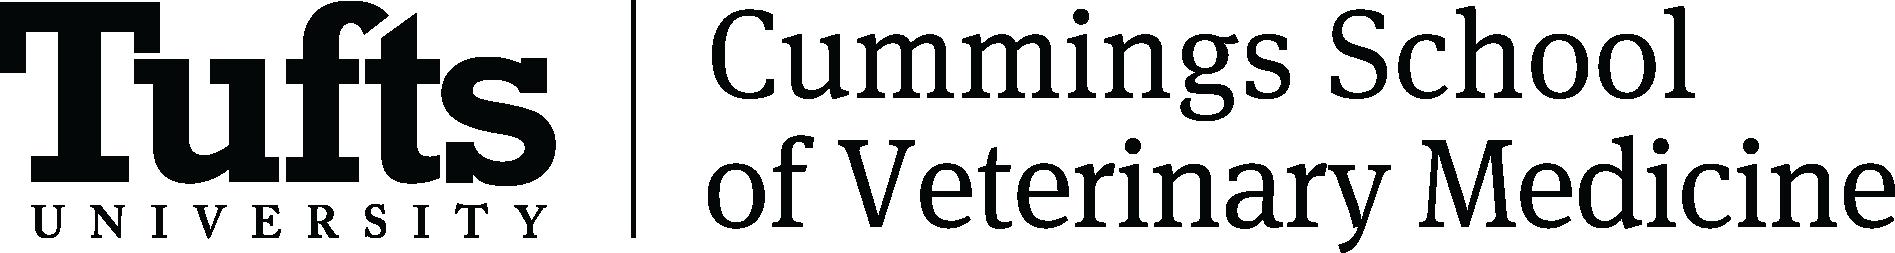 Cummings School of Veterinary Medicine at Tufts University